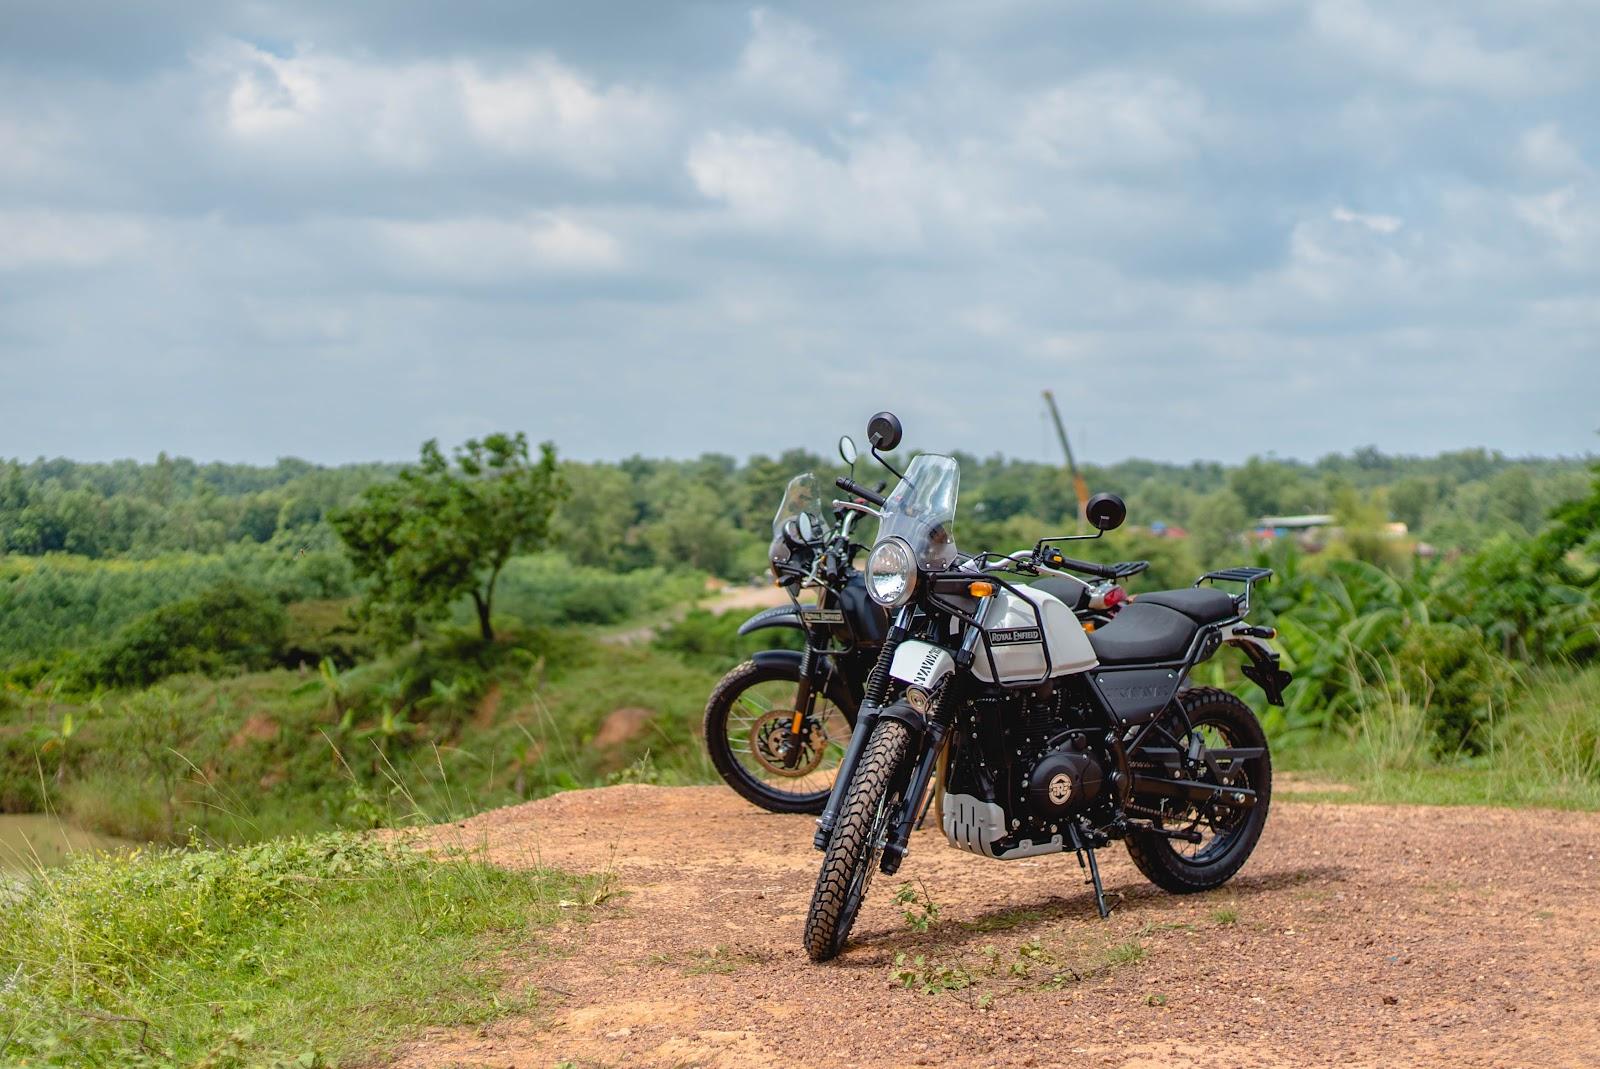 Onyabike Adventures motorcycles on display